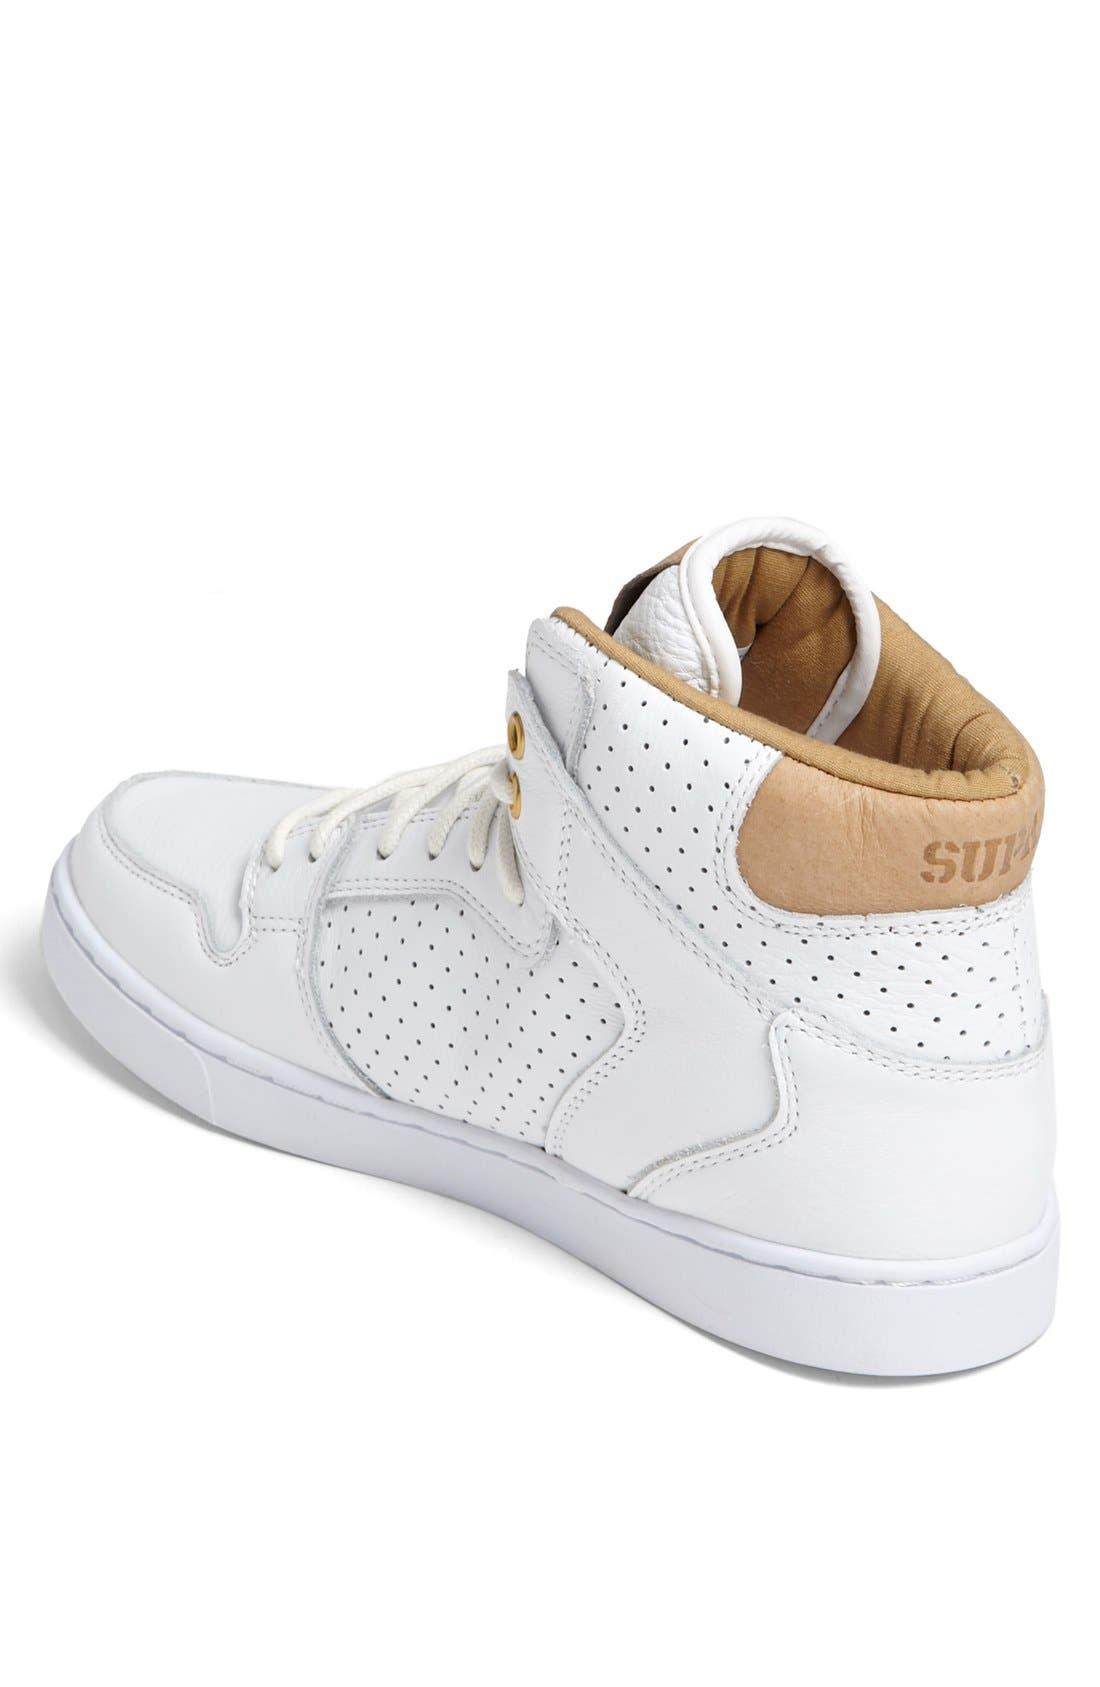 Alternate Image 2  - Supra 'Vaider LX' Sneaker (Men)